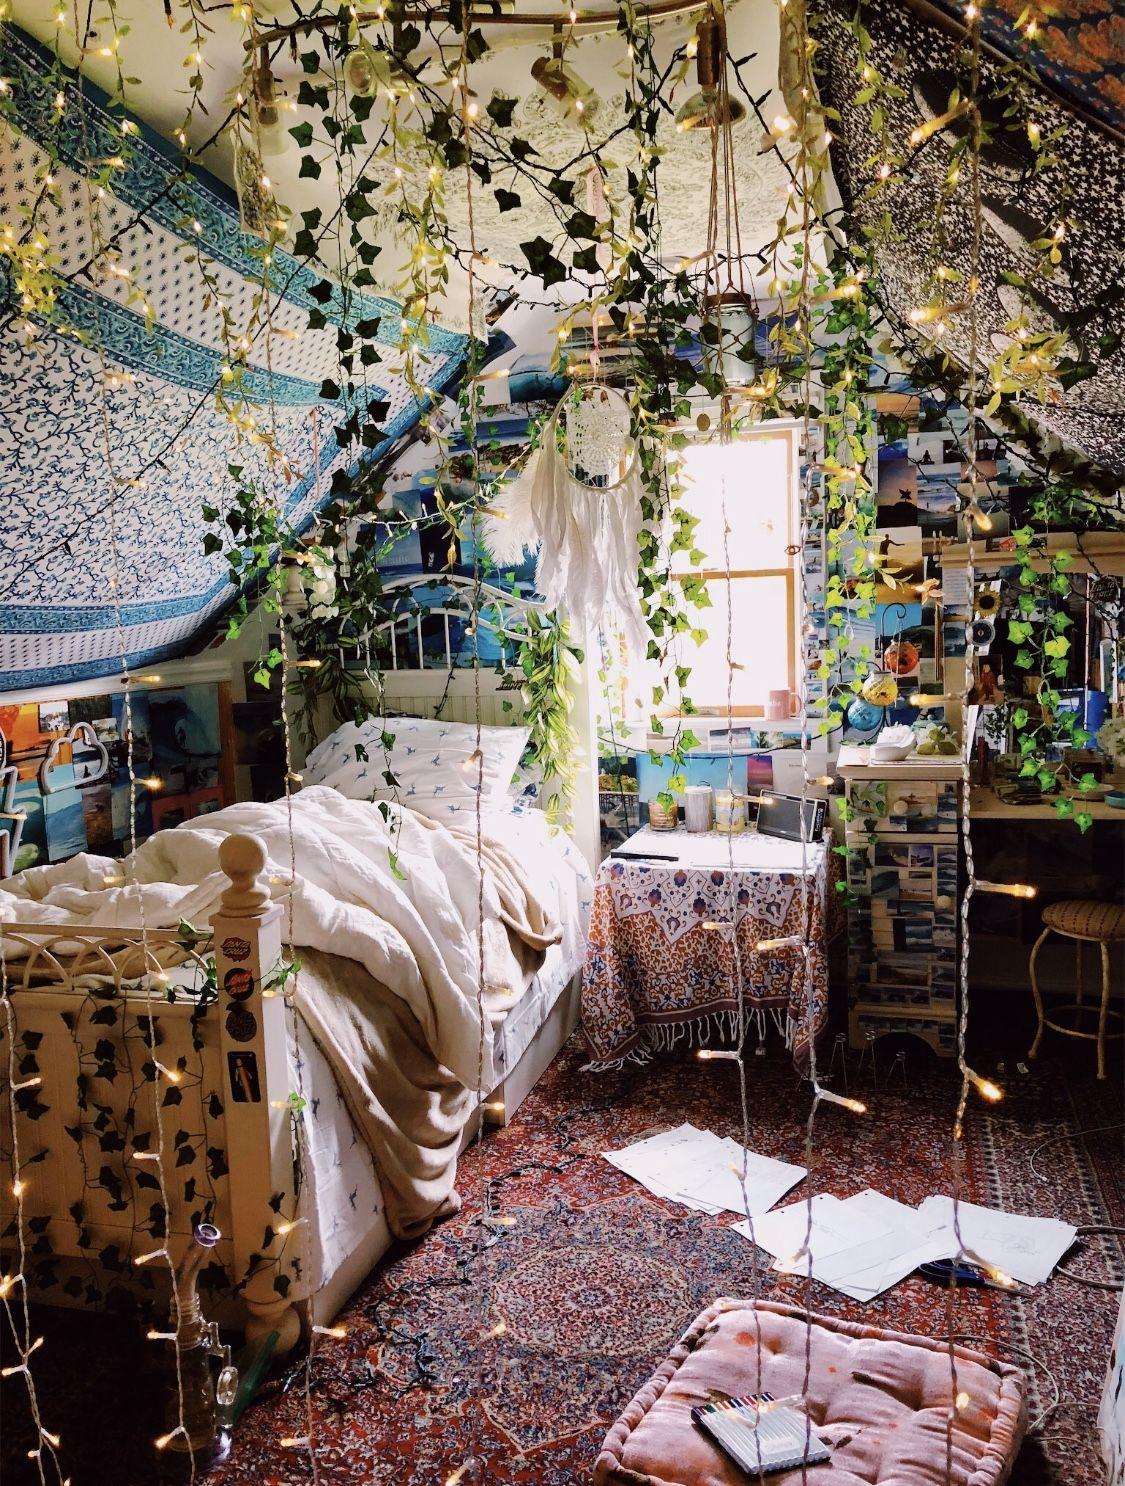 Bohemian Whimsical Bedroom Decor Houseplants Colorful In 2020 Bohemian Bedroom Decor Hippie Room Ideas Bedroom Bohemian Bedroom Decor